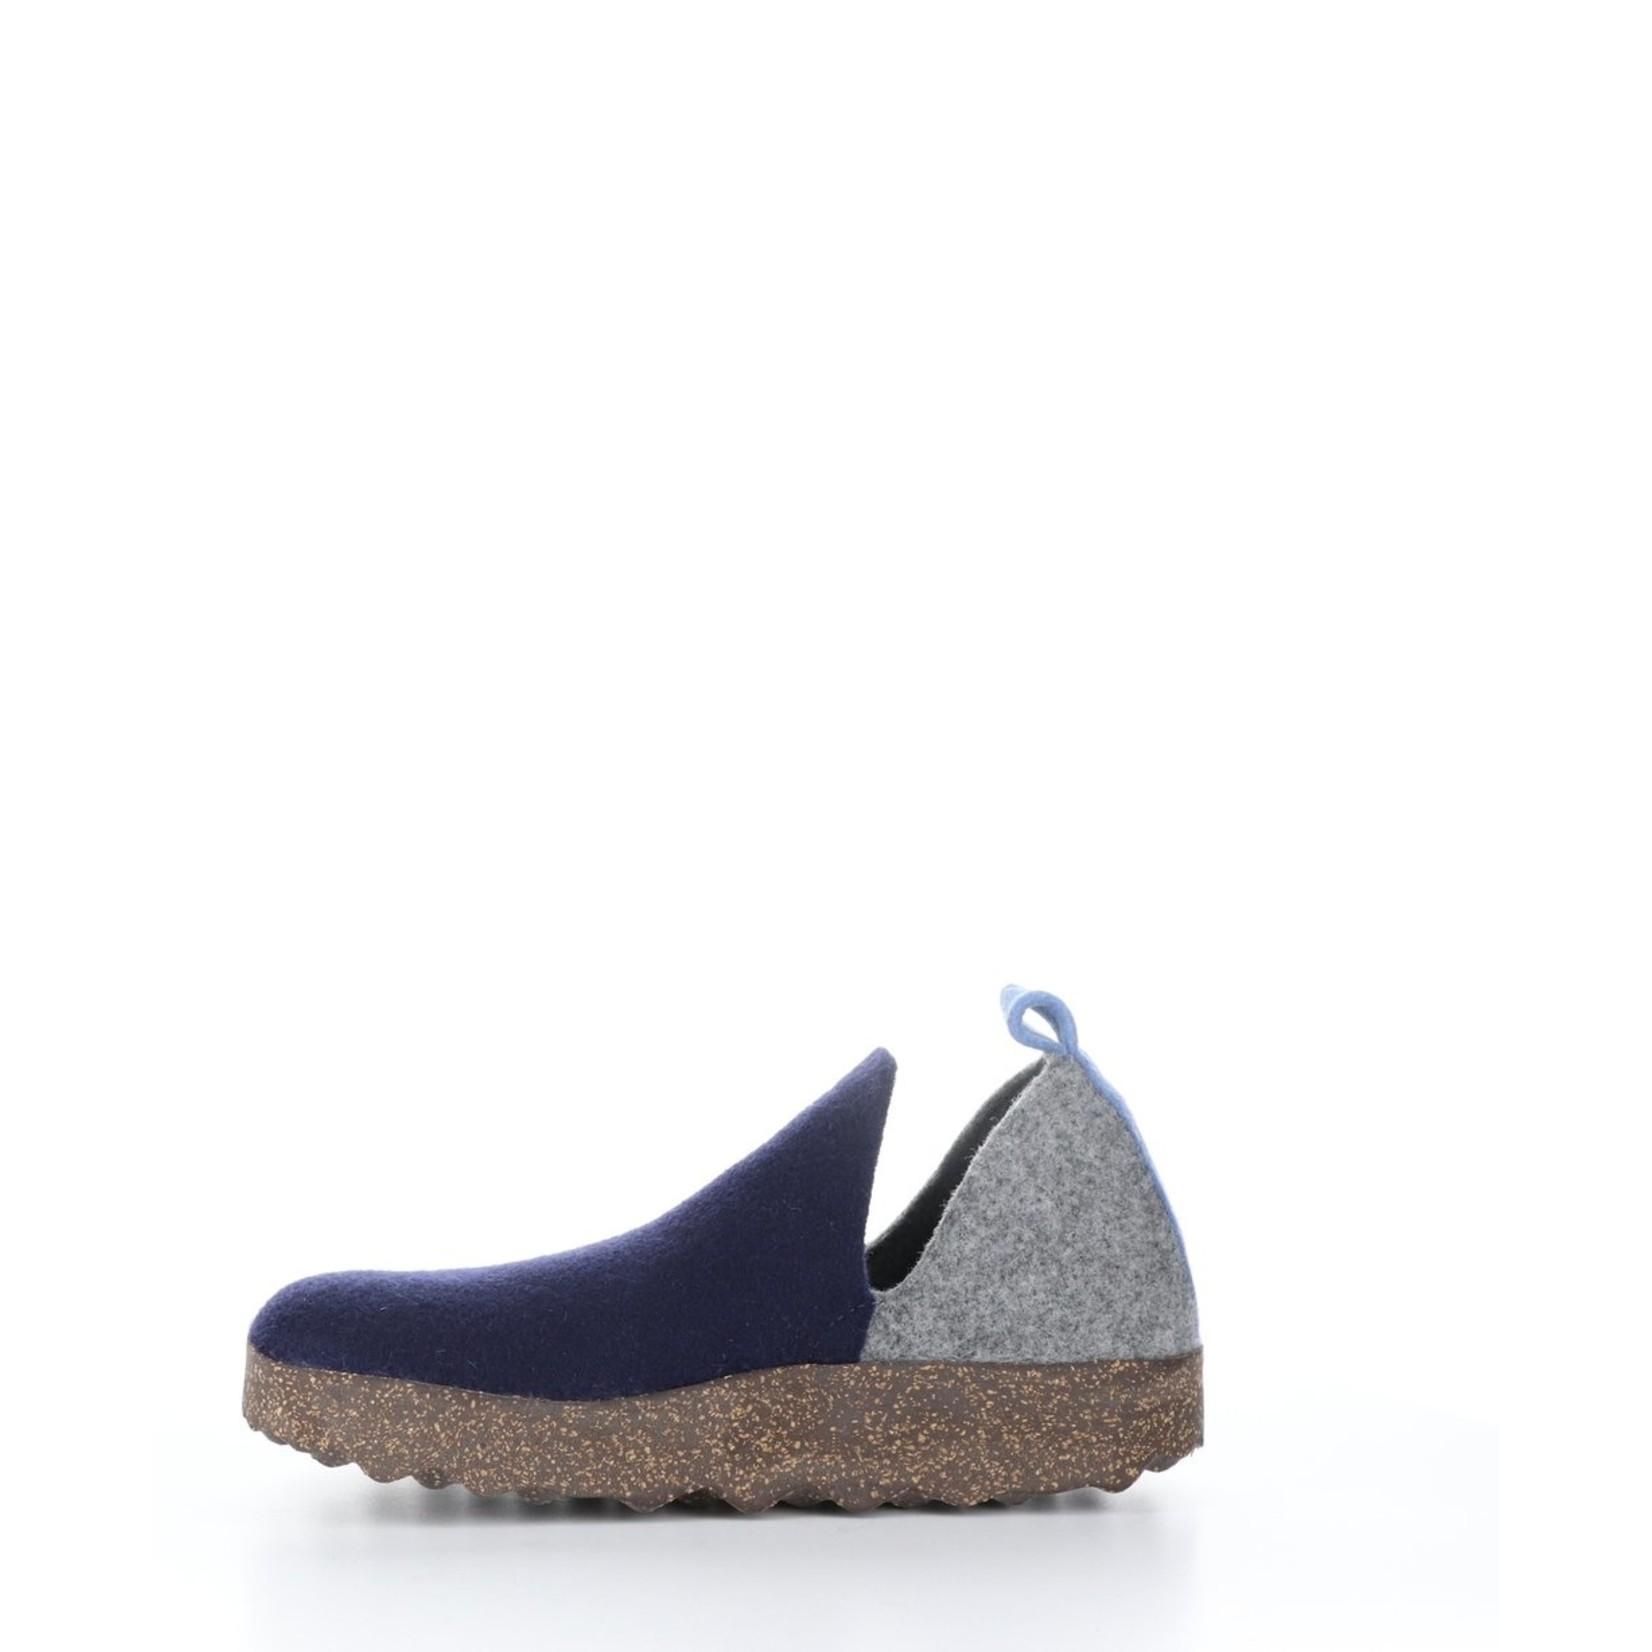 Asportuguesas City Slip-On Combo Shoes